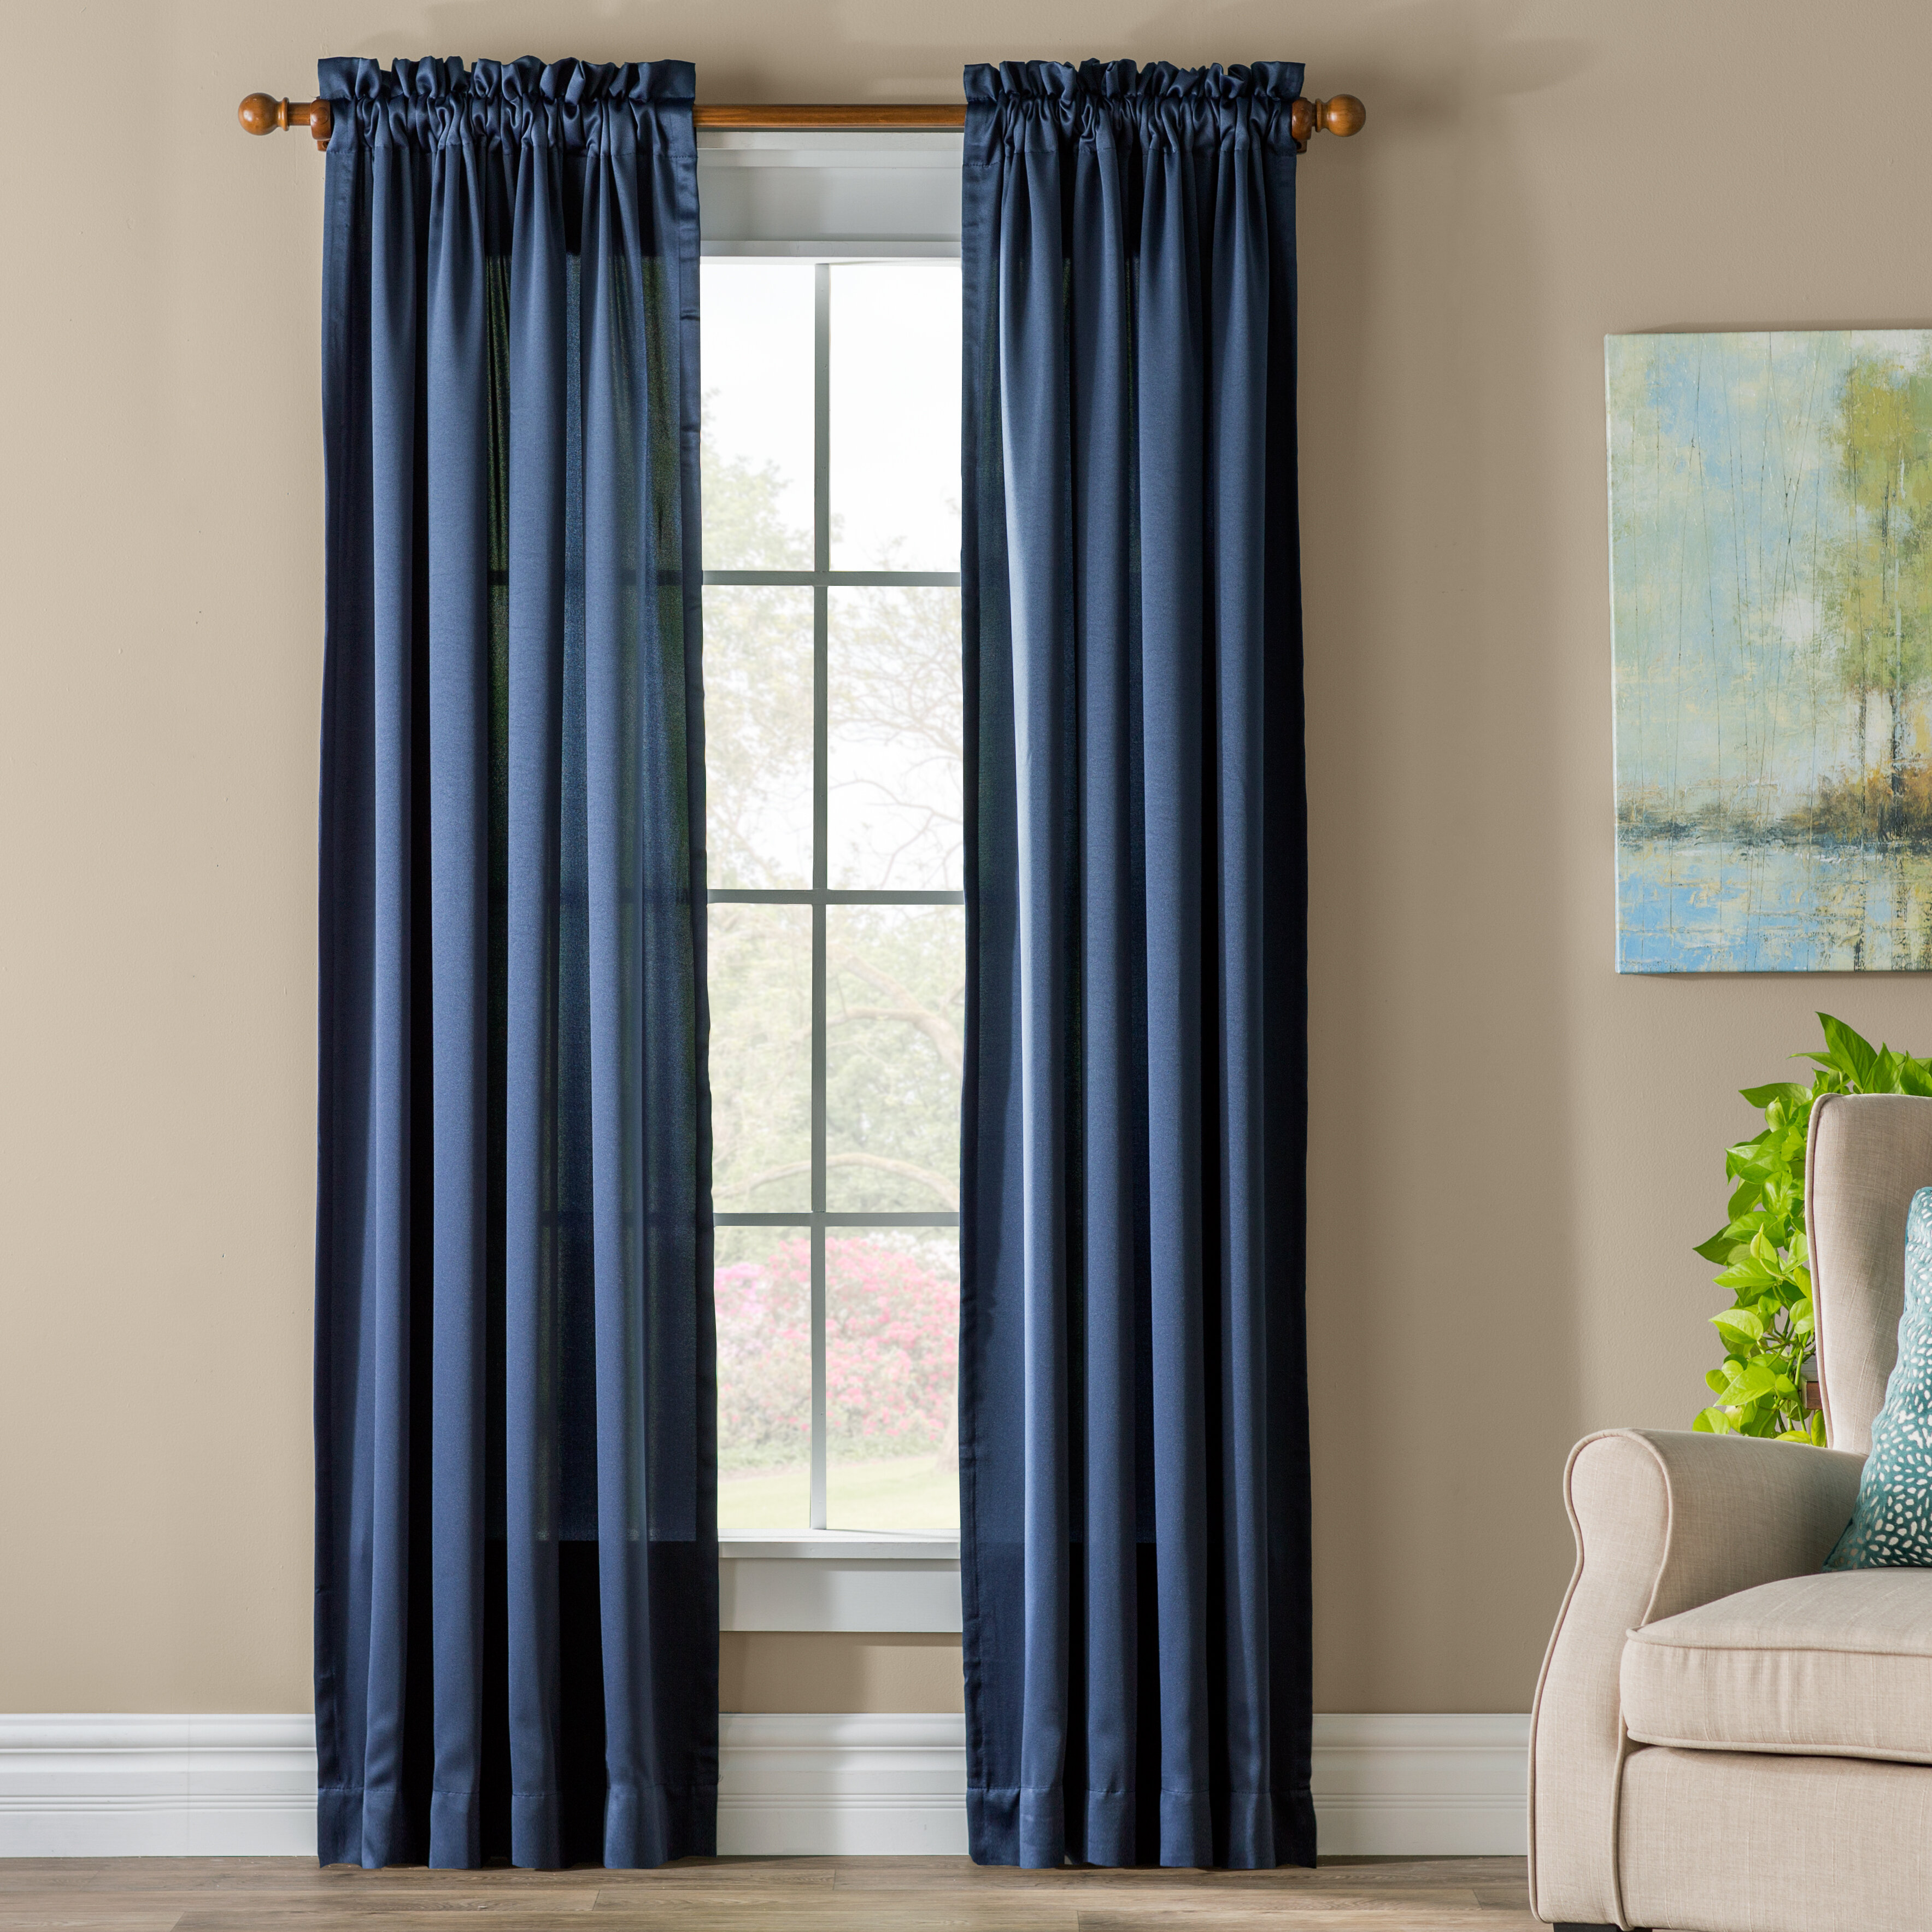 Grover Solid Semi Sheer Rod Pocket Single Curtain Panel Reviews Joss Main